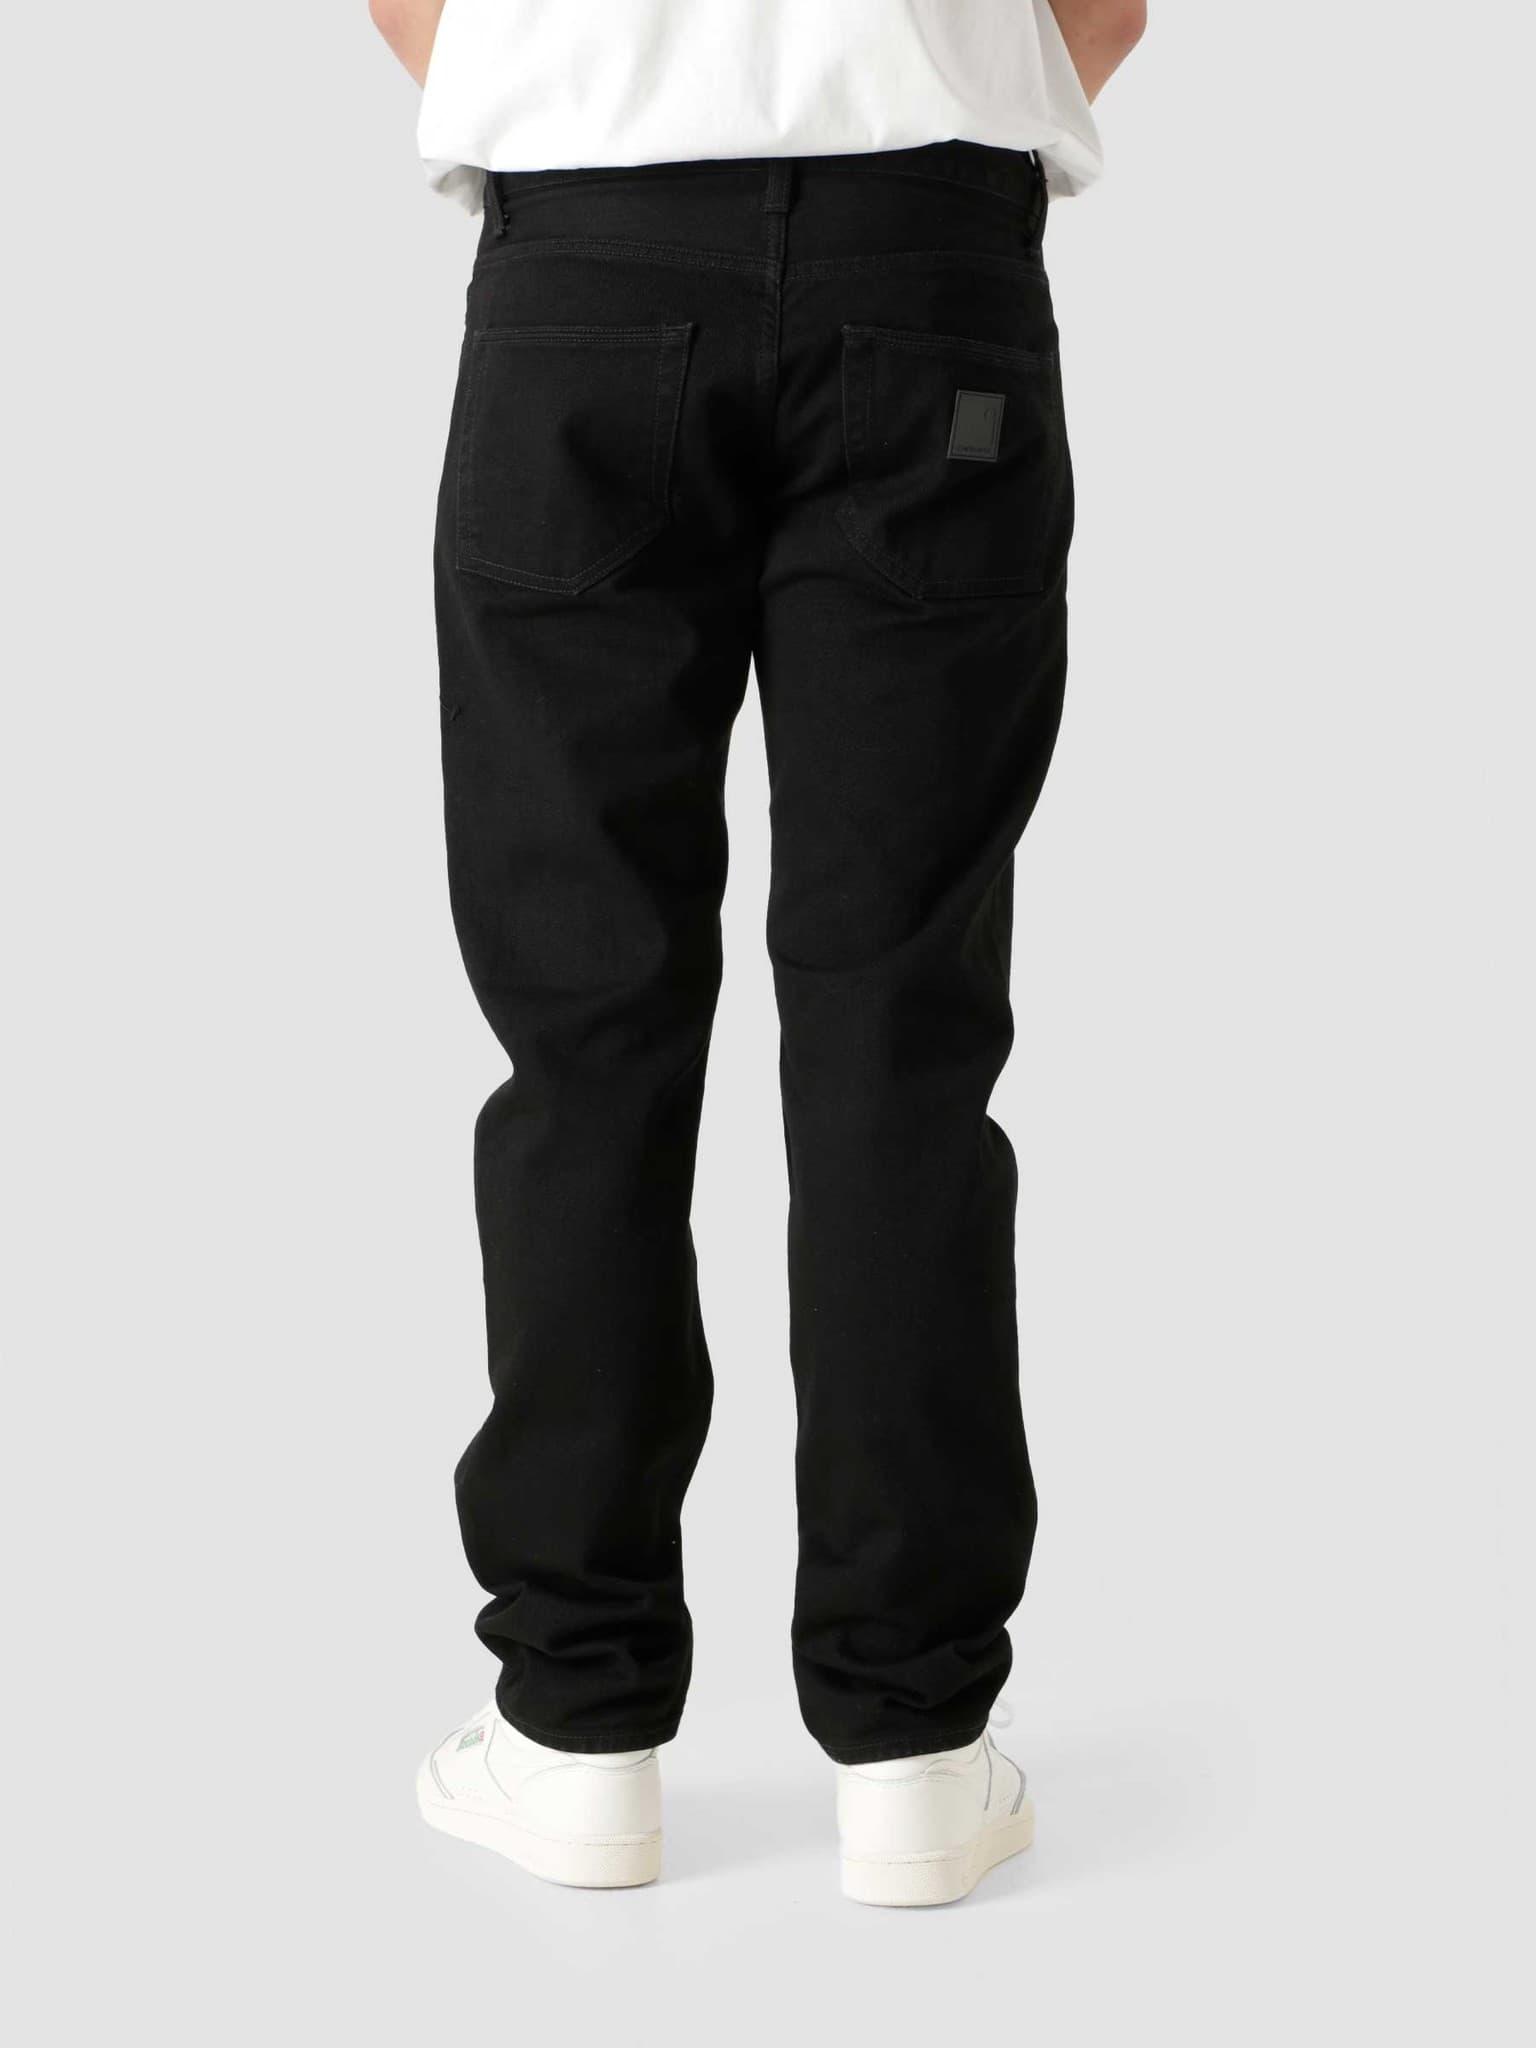 Klondike Pant Black One Wash I029207-892Y